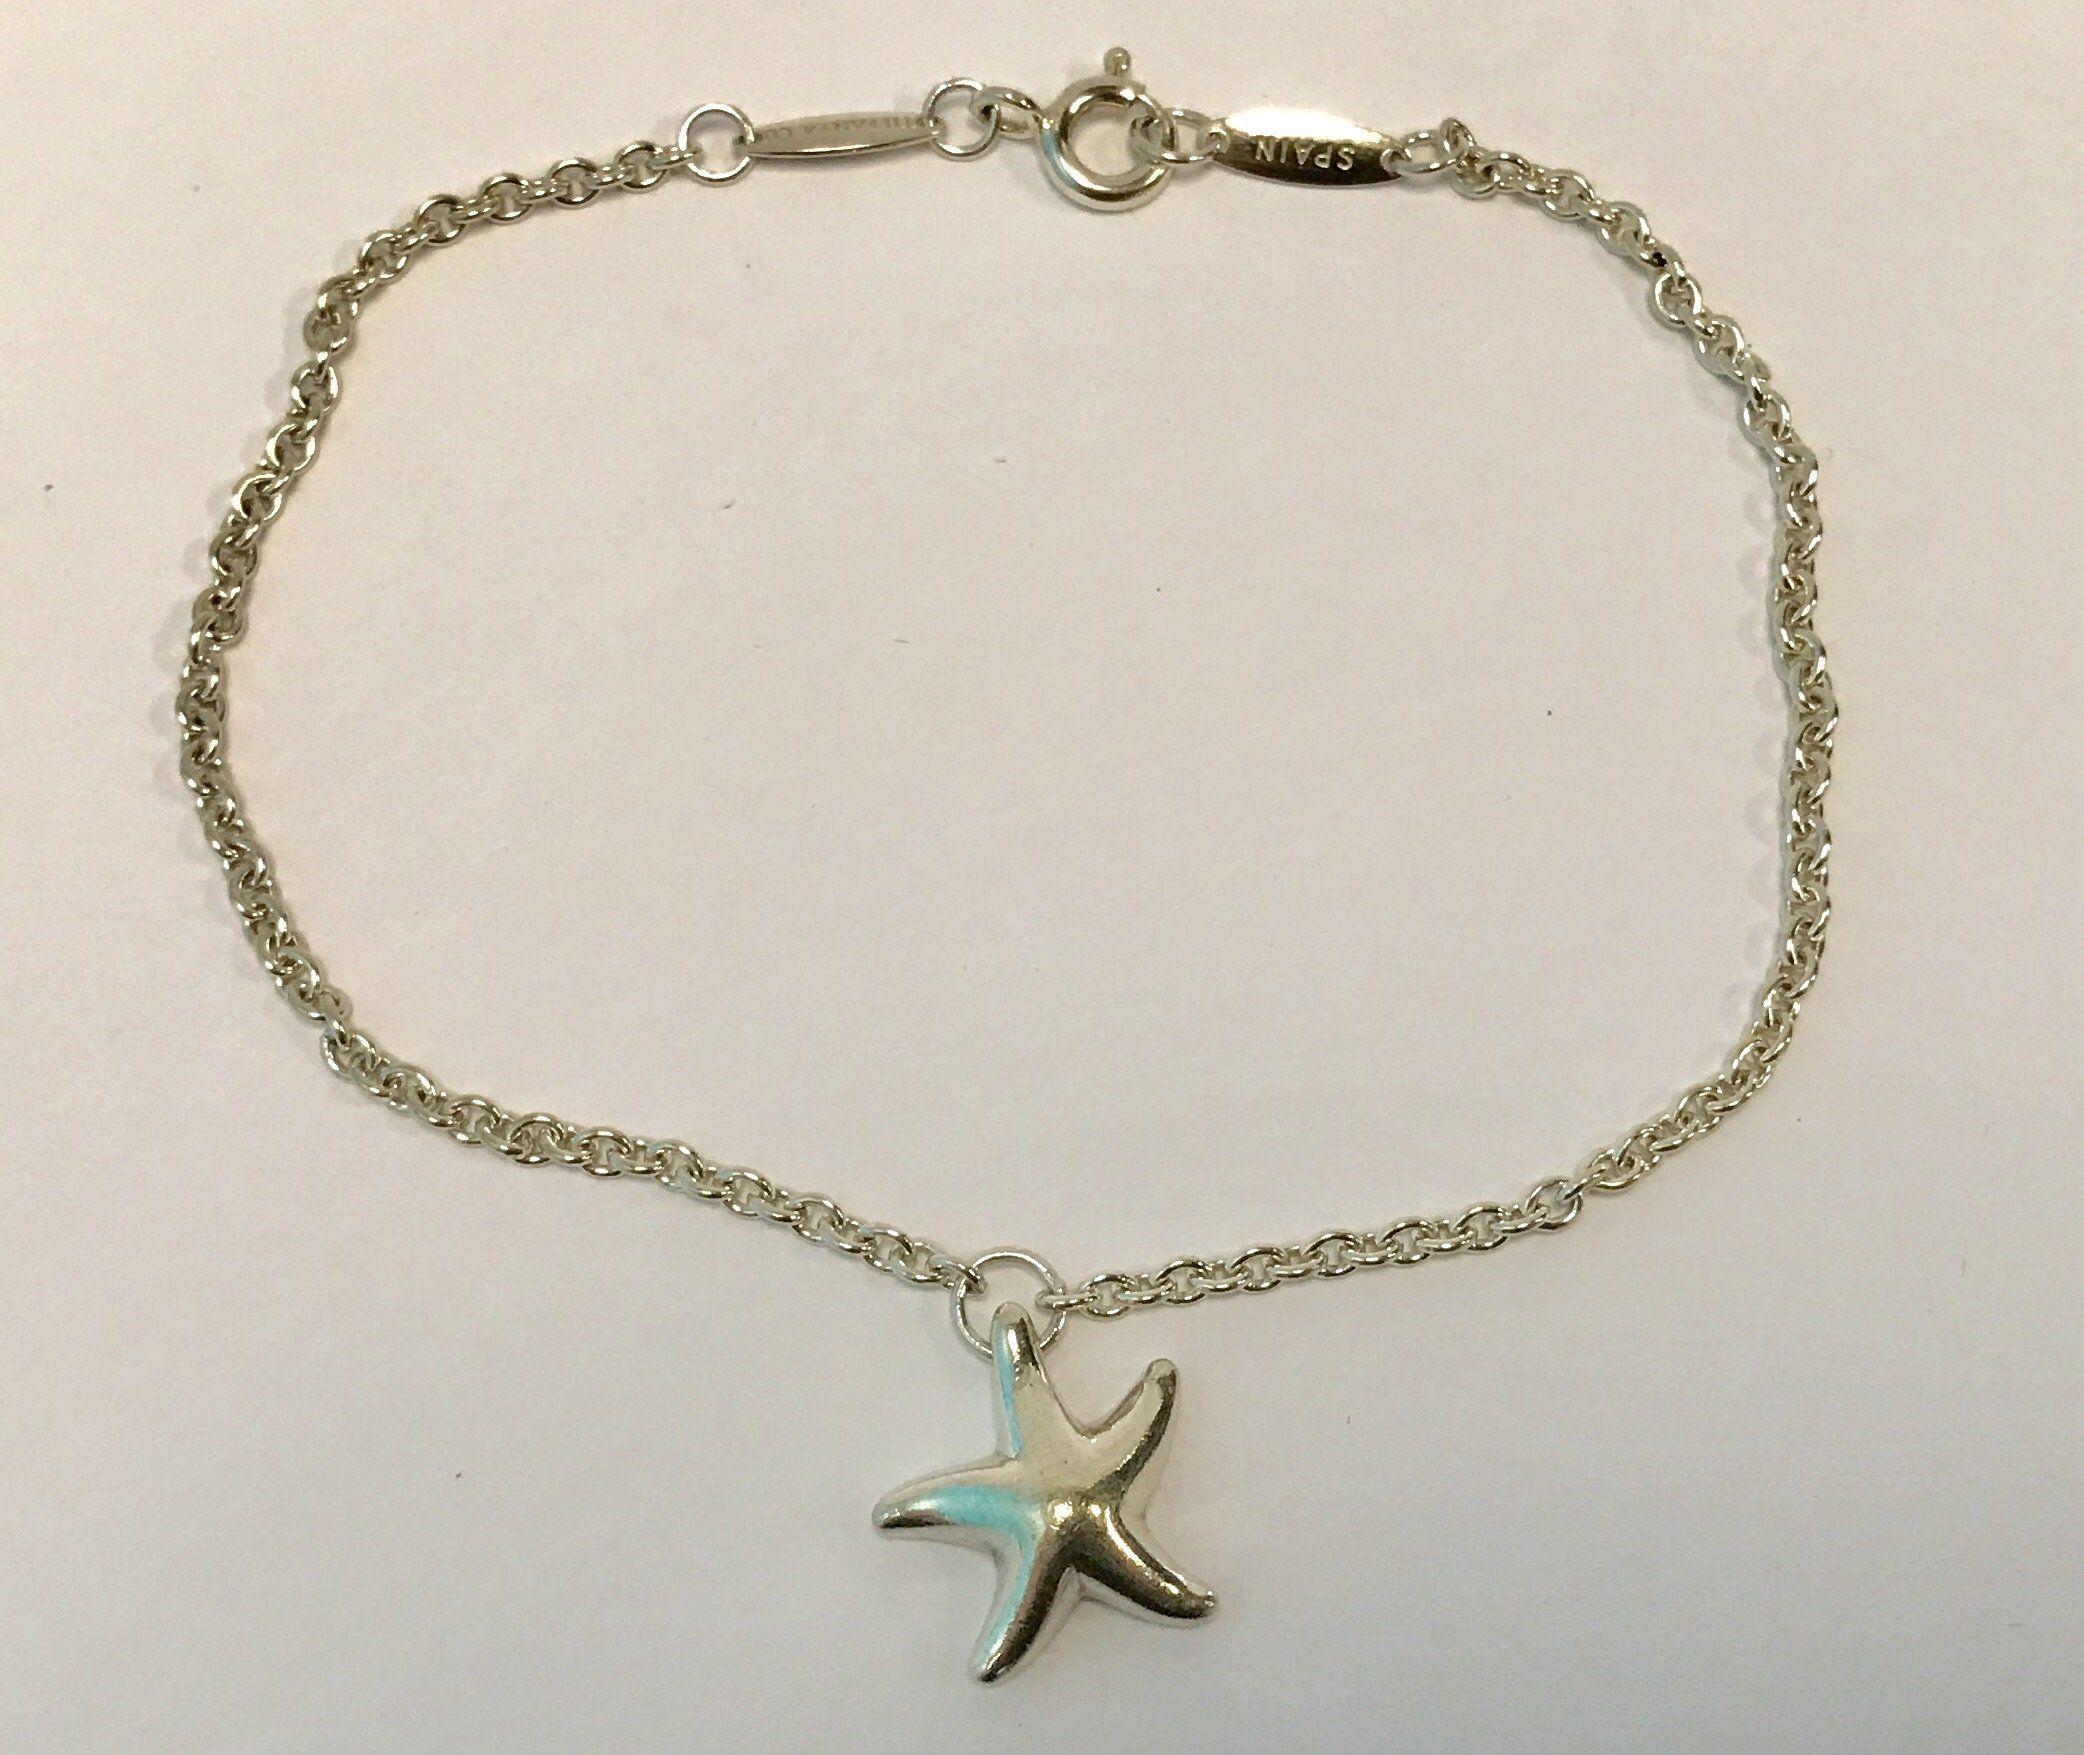 8d1cbfef0 Tiffany & Co Sterling Silver Elsa Peretti Starfish Bracelet ...